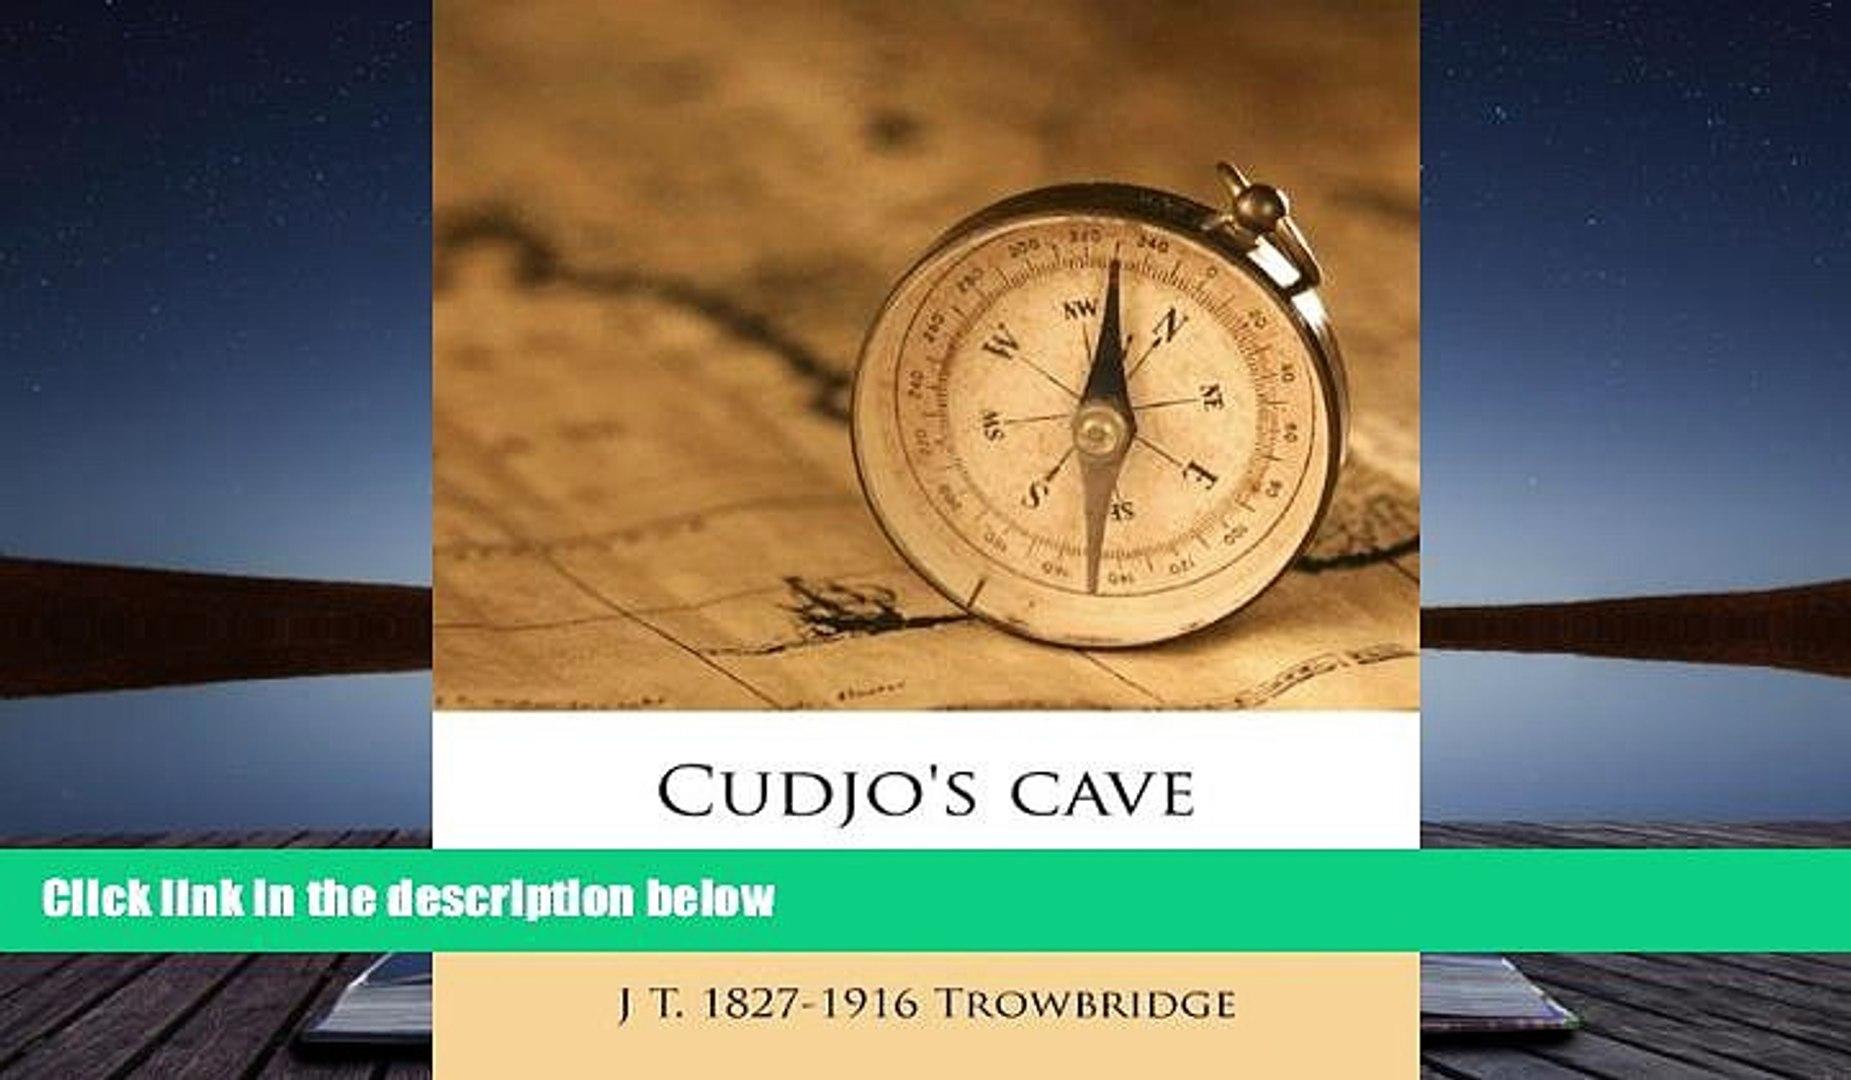 Online J T. 1827-1916 Trowbridge Cudjo s cave Full Book Download